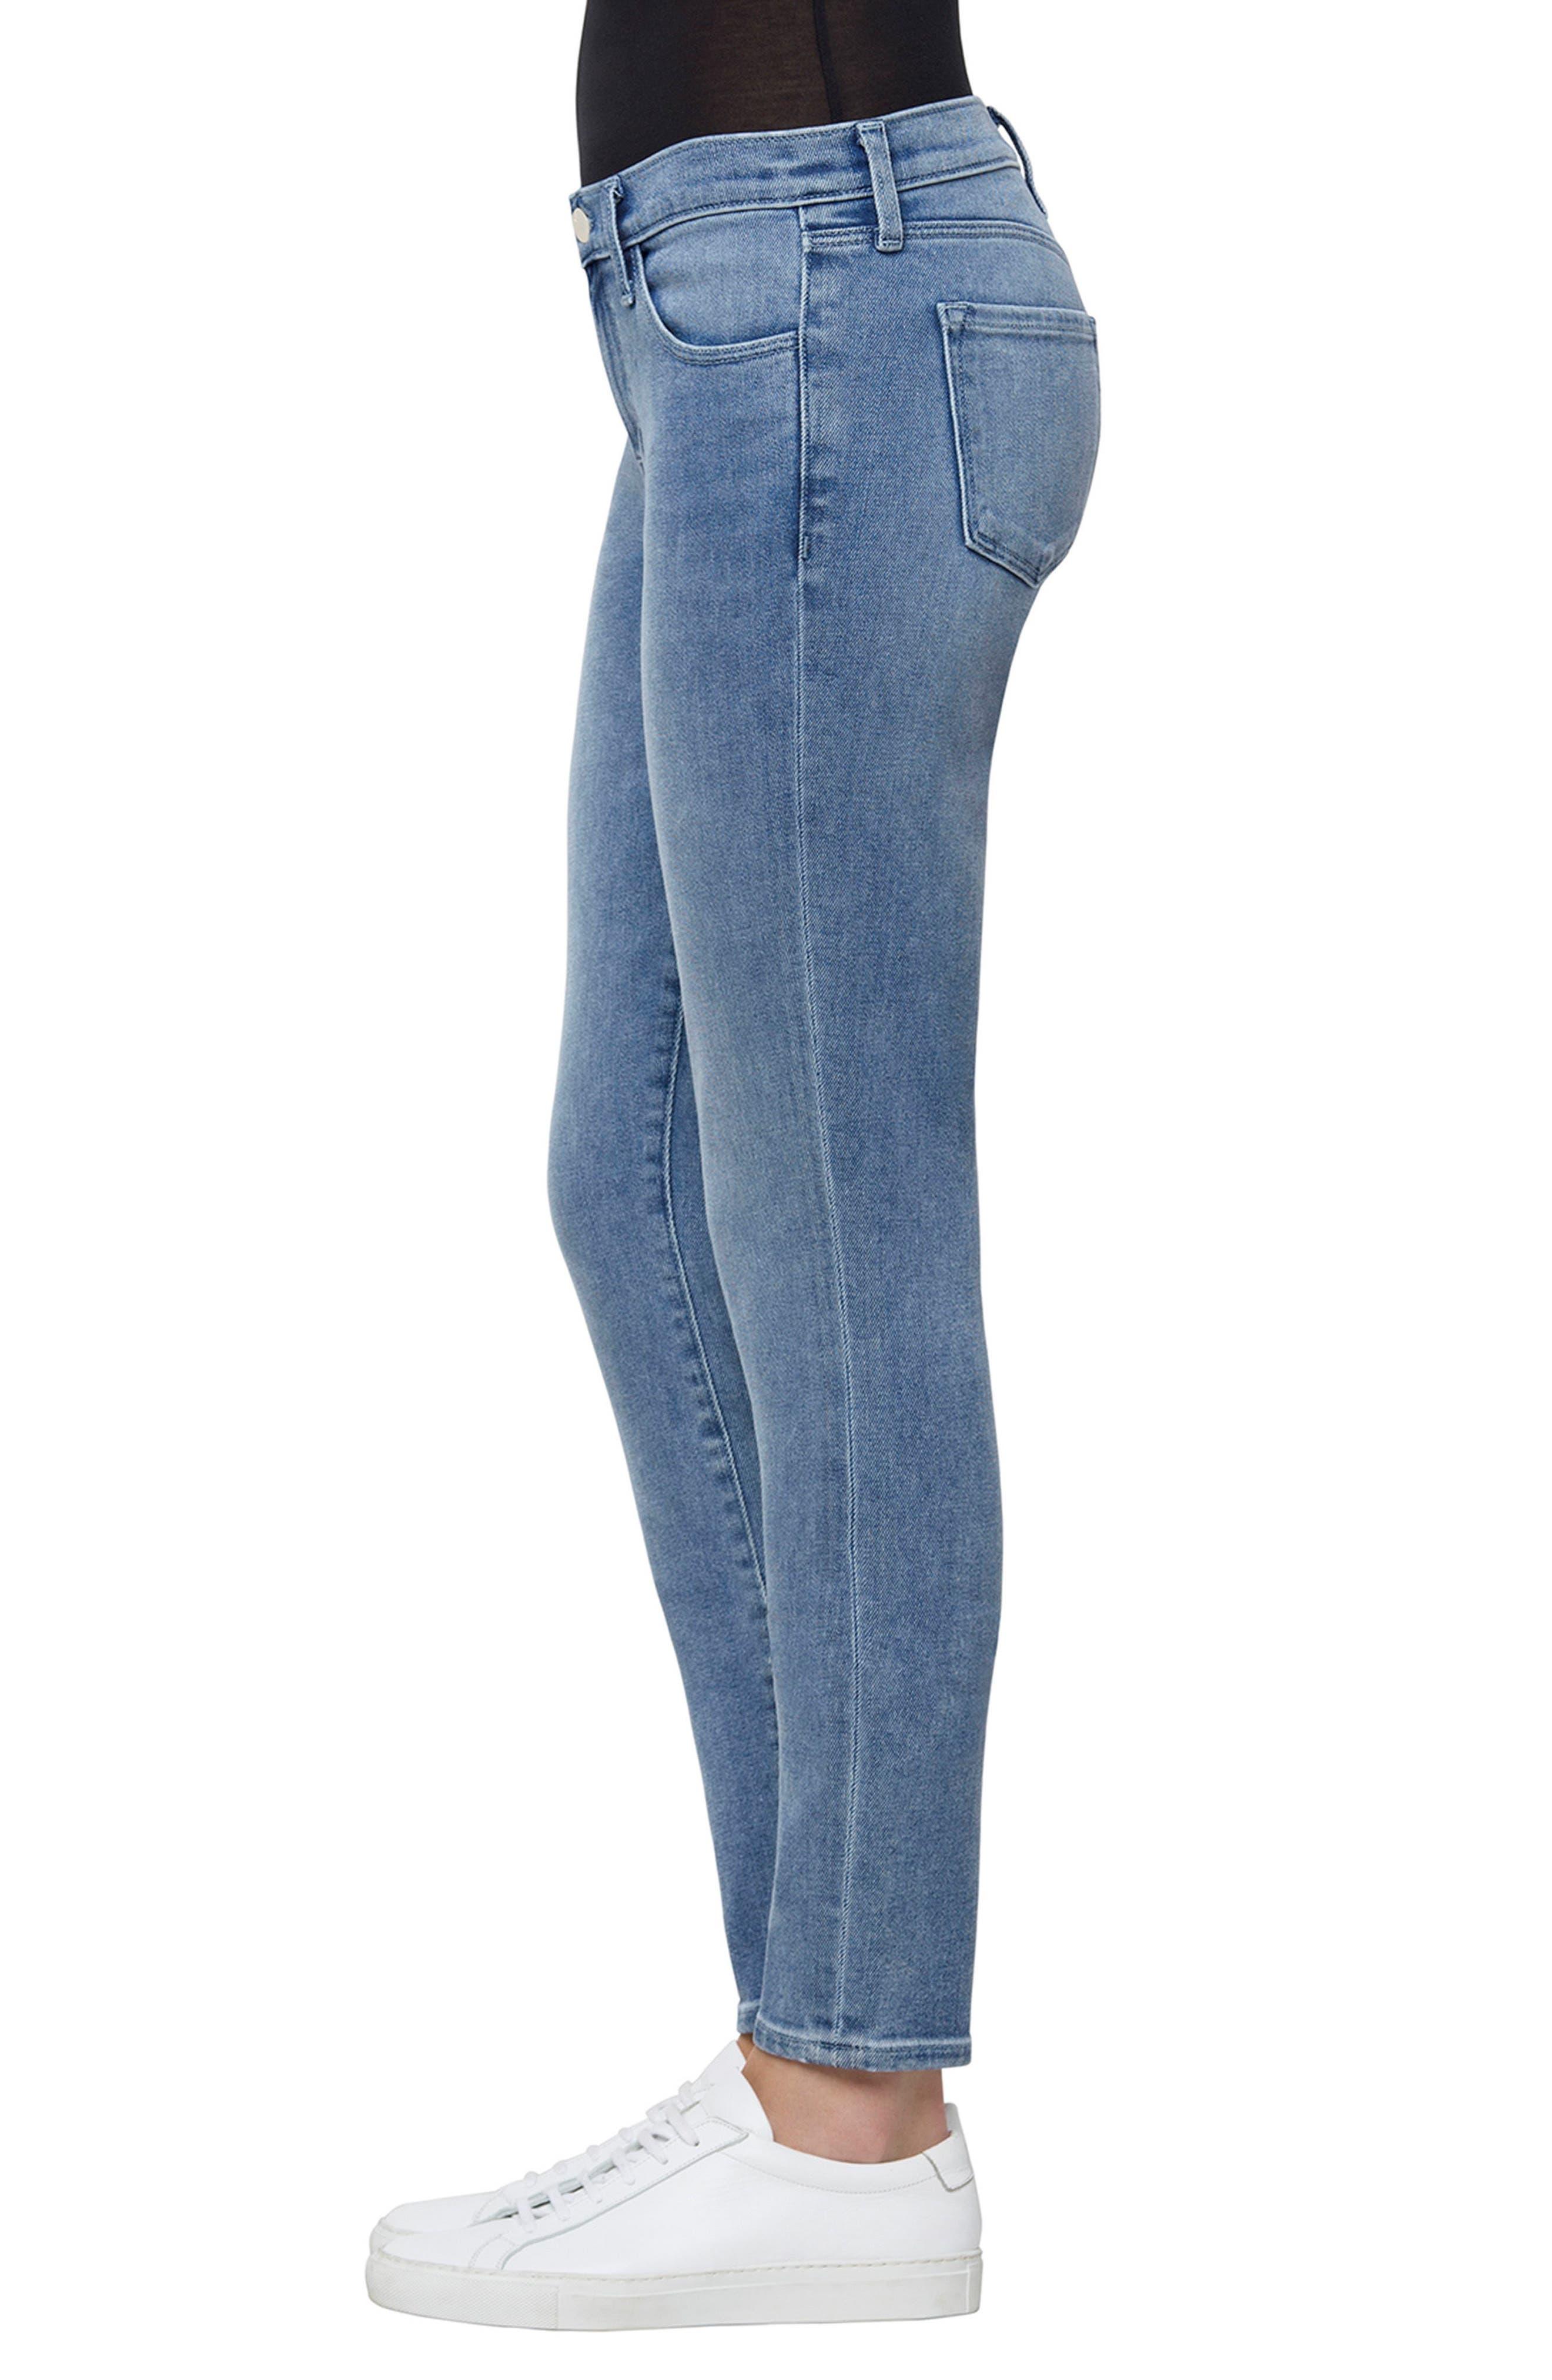 811 Skinny Jeans,                             Alternate thumbnail 3, color,                             455